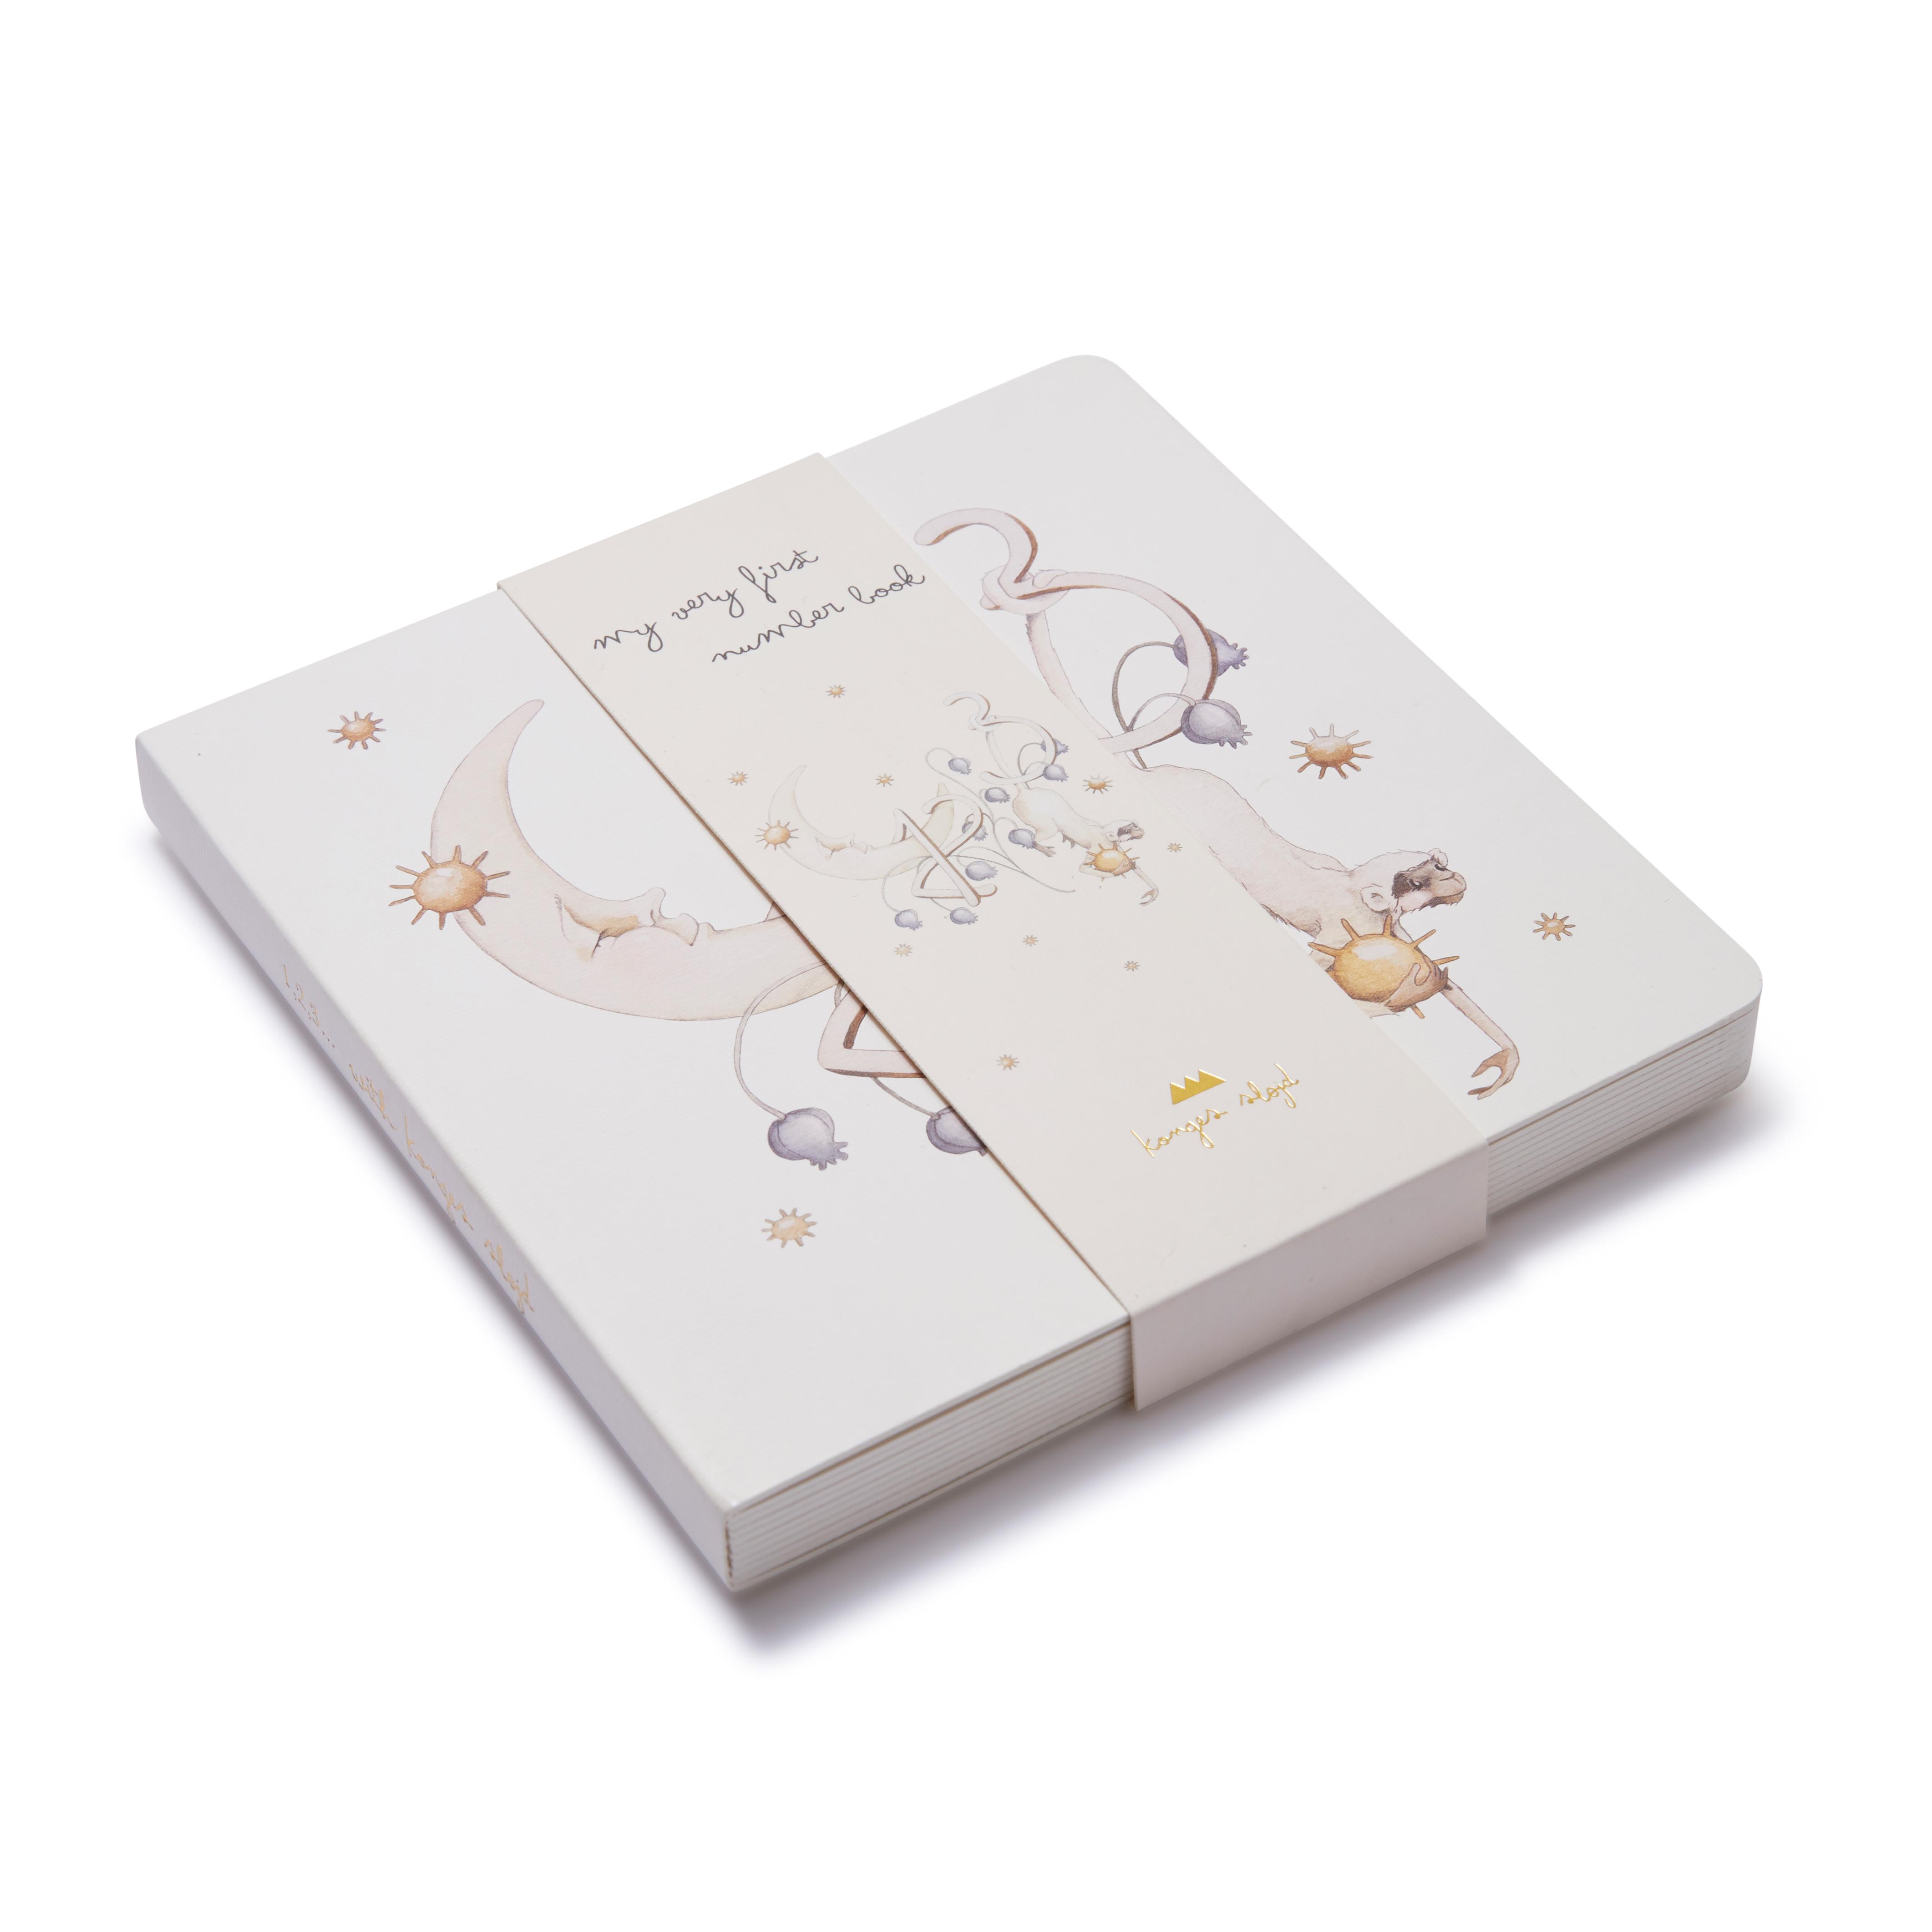 Konges sløjd - My first number book -